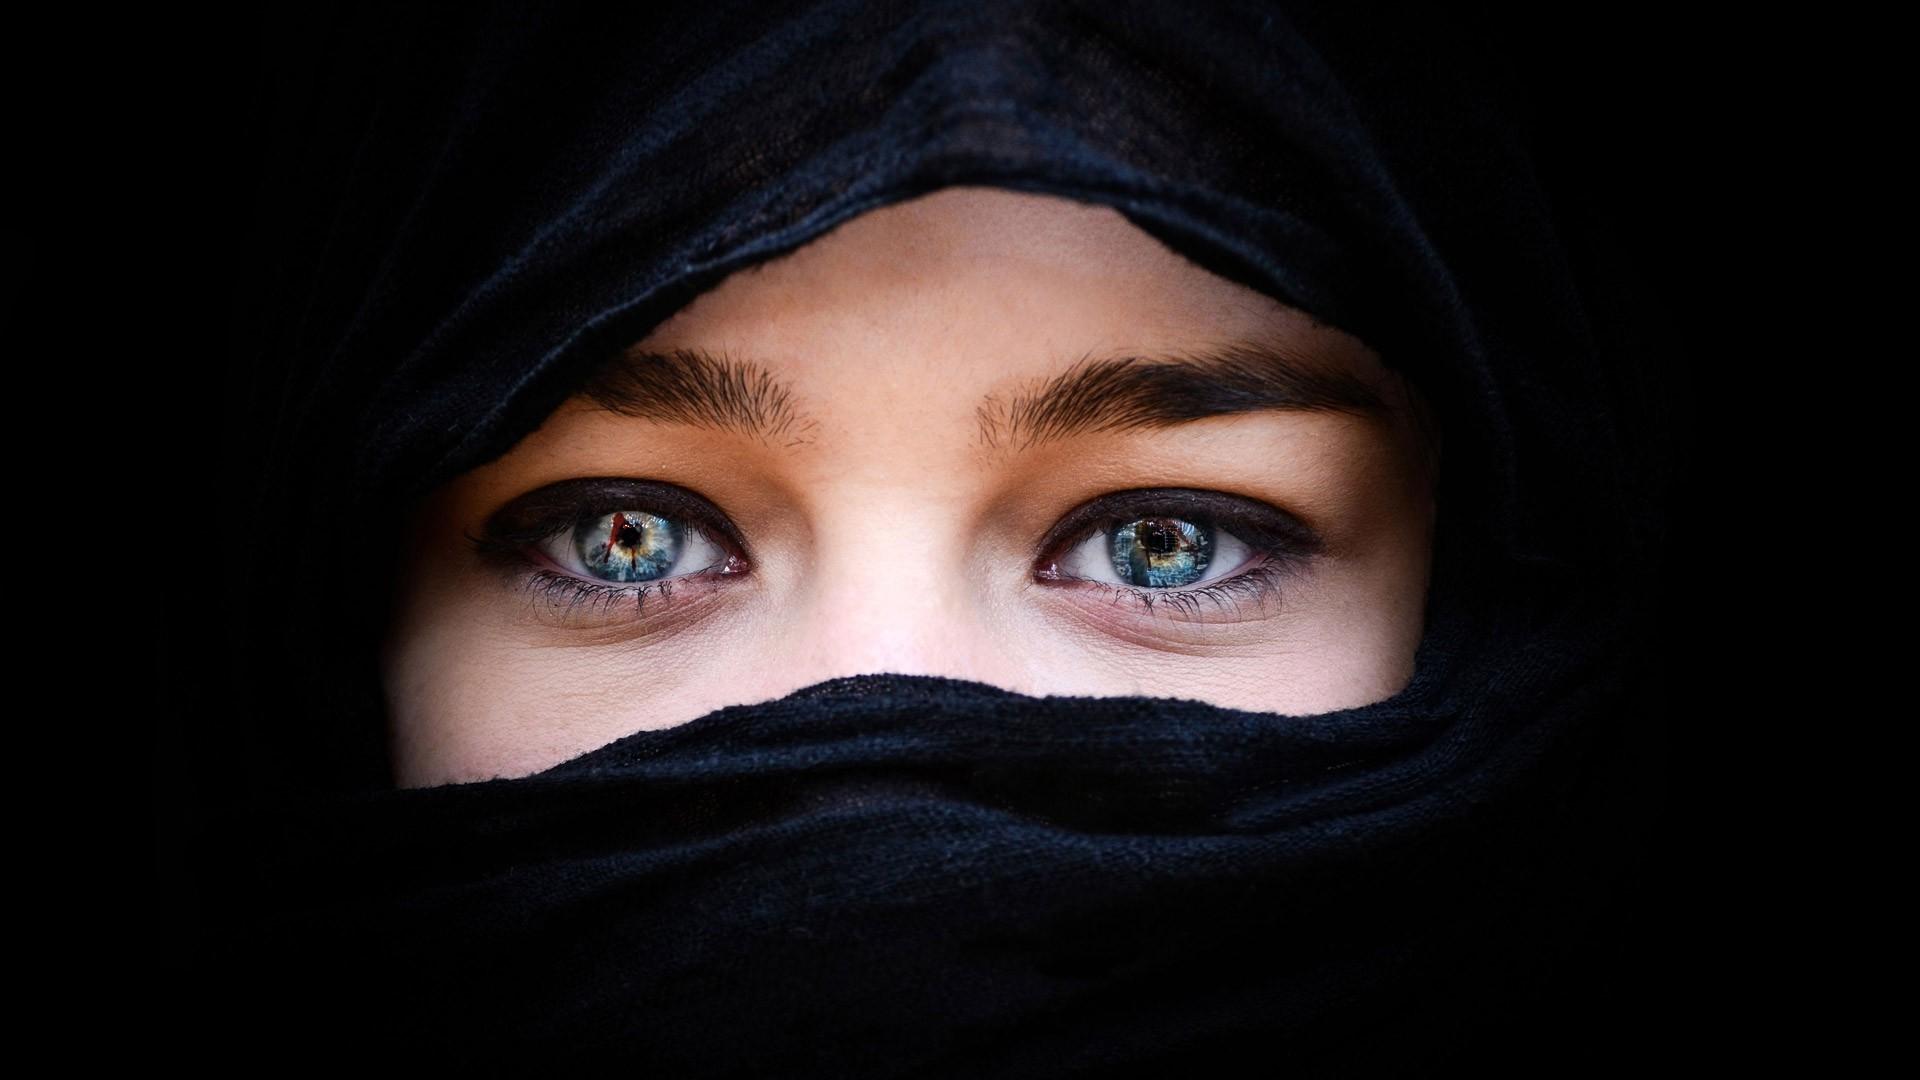 Muslim Girl Eyes Wallpapers Arabic Background For Desktop Pixelstalk Net